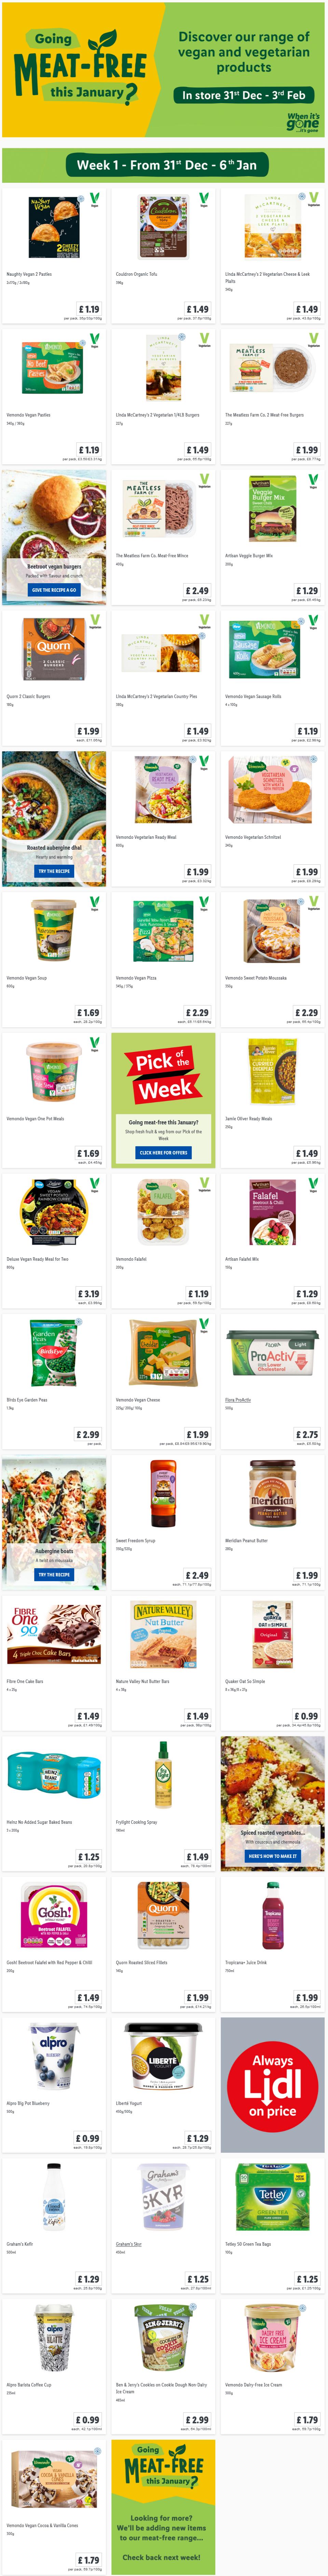 LIDL Veganuary Offers (Meat Free) From Thursday, 31st December 2020